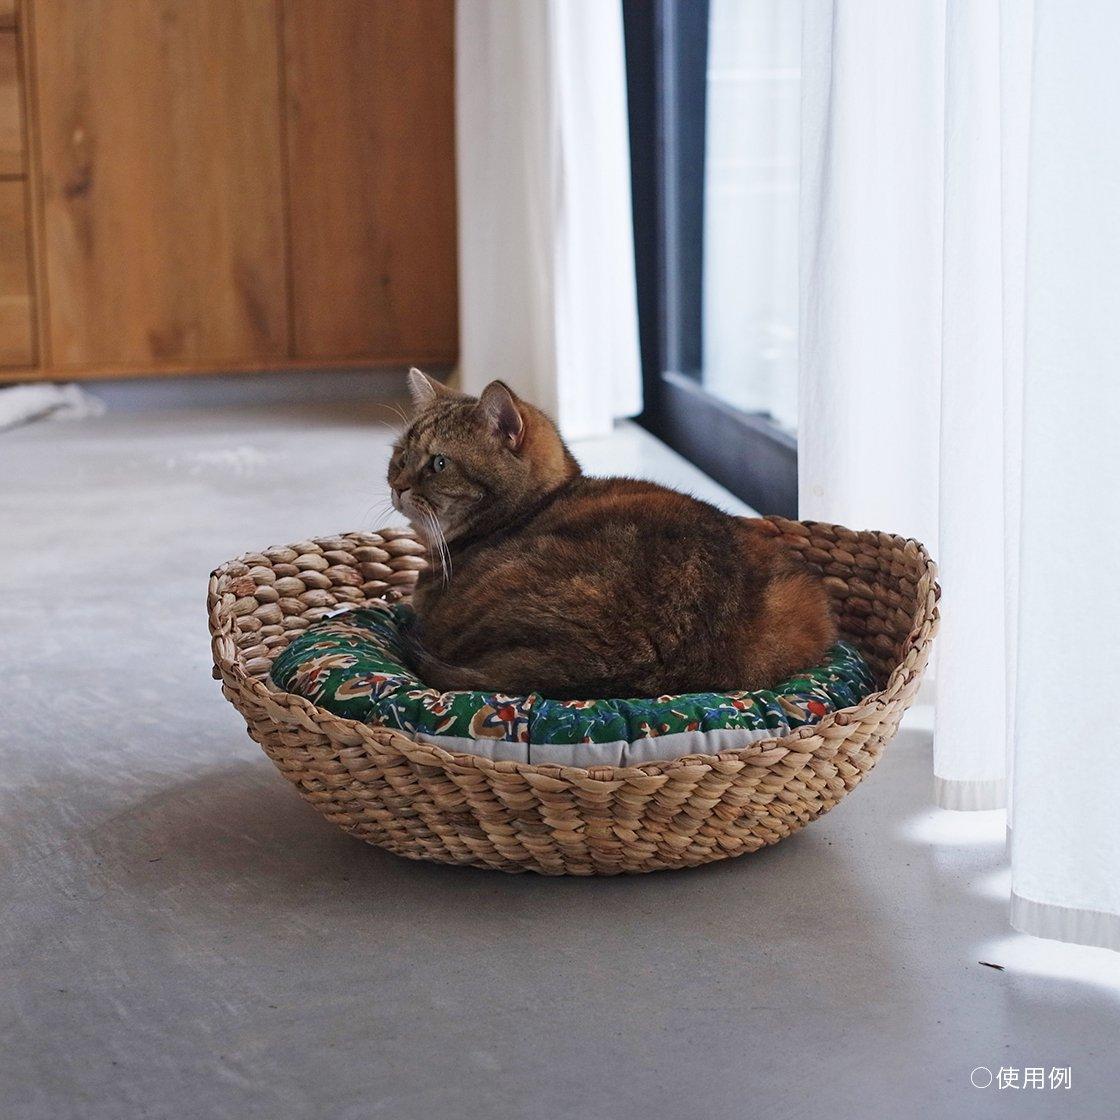 <img class='new_mark_img1' src='https://img.shop-pro.jp/img/new/icons57.gif' style='border:none;display:inline;margin:0px;padding:0px;width:auto;' />OZABUクッション-Lサイズ【ハンドブロック/グレー系 #2】 /For Cat